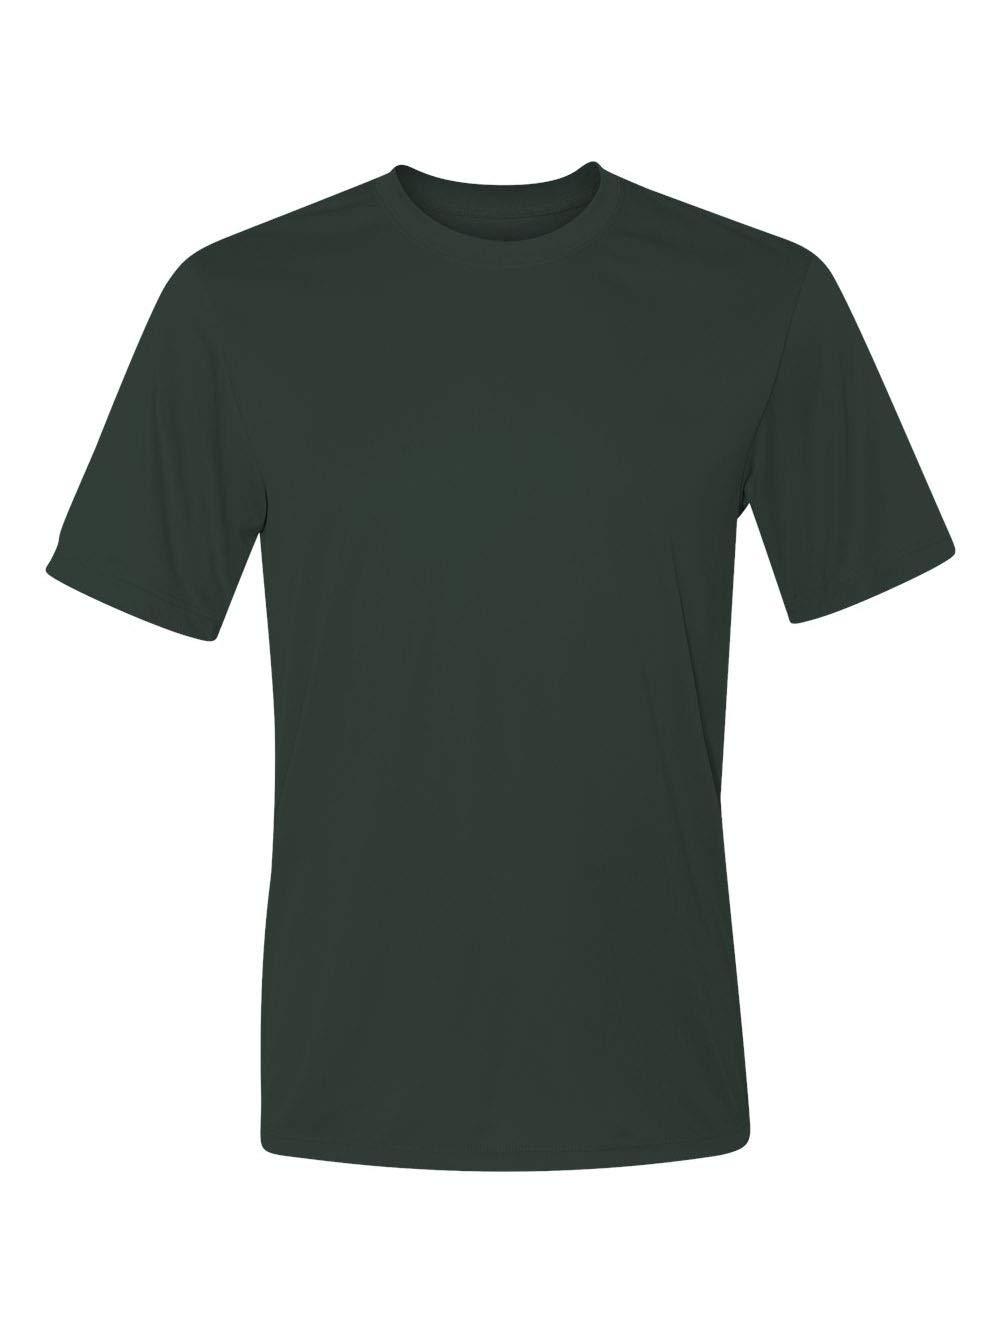 Hanes Cool DRI TAGLESS Men's T-Shirt, Deep Forest, XXX-Large